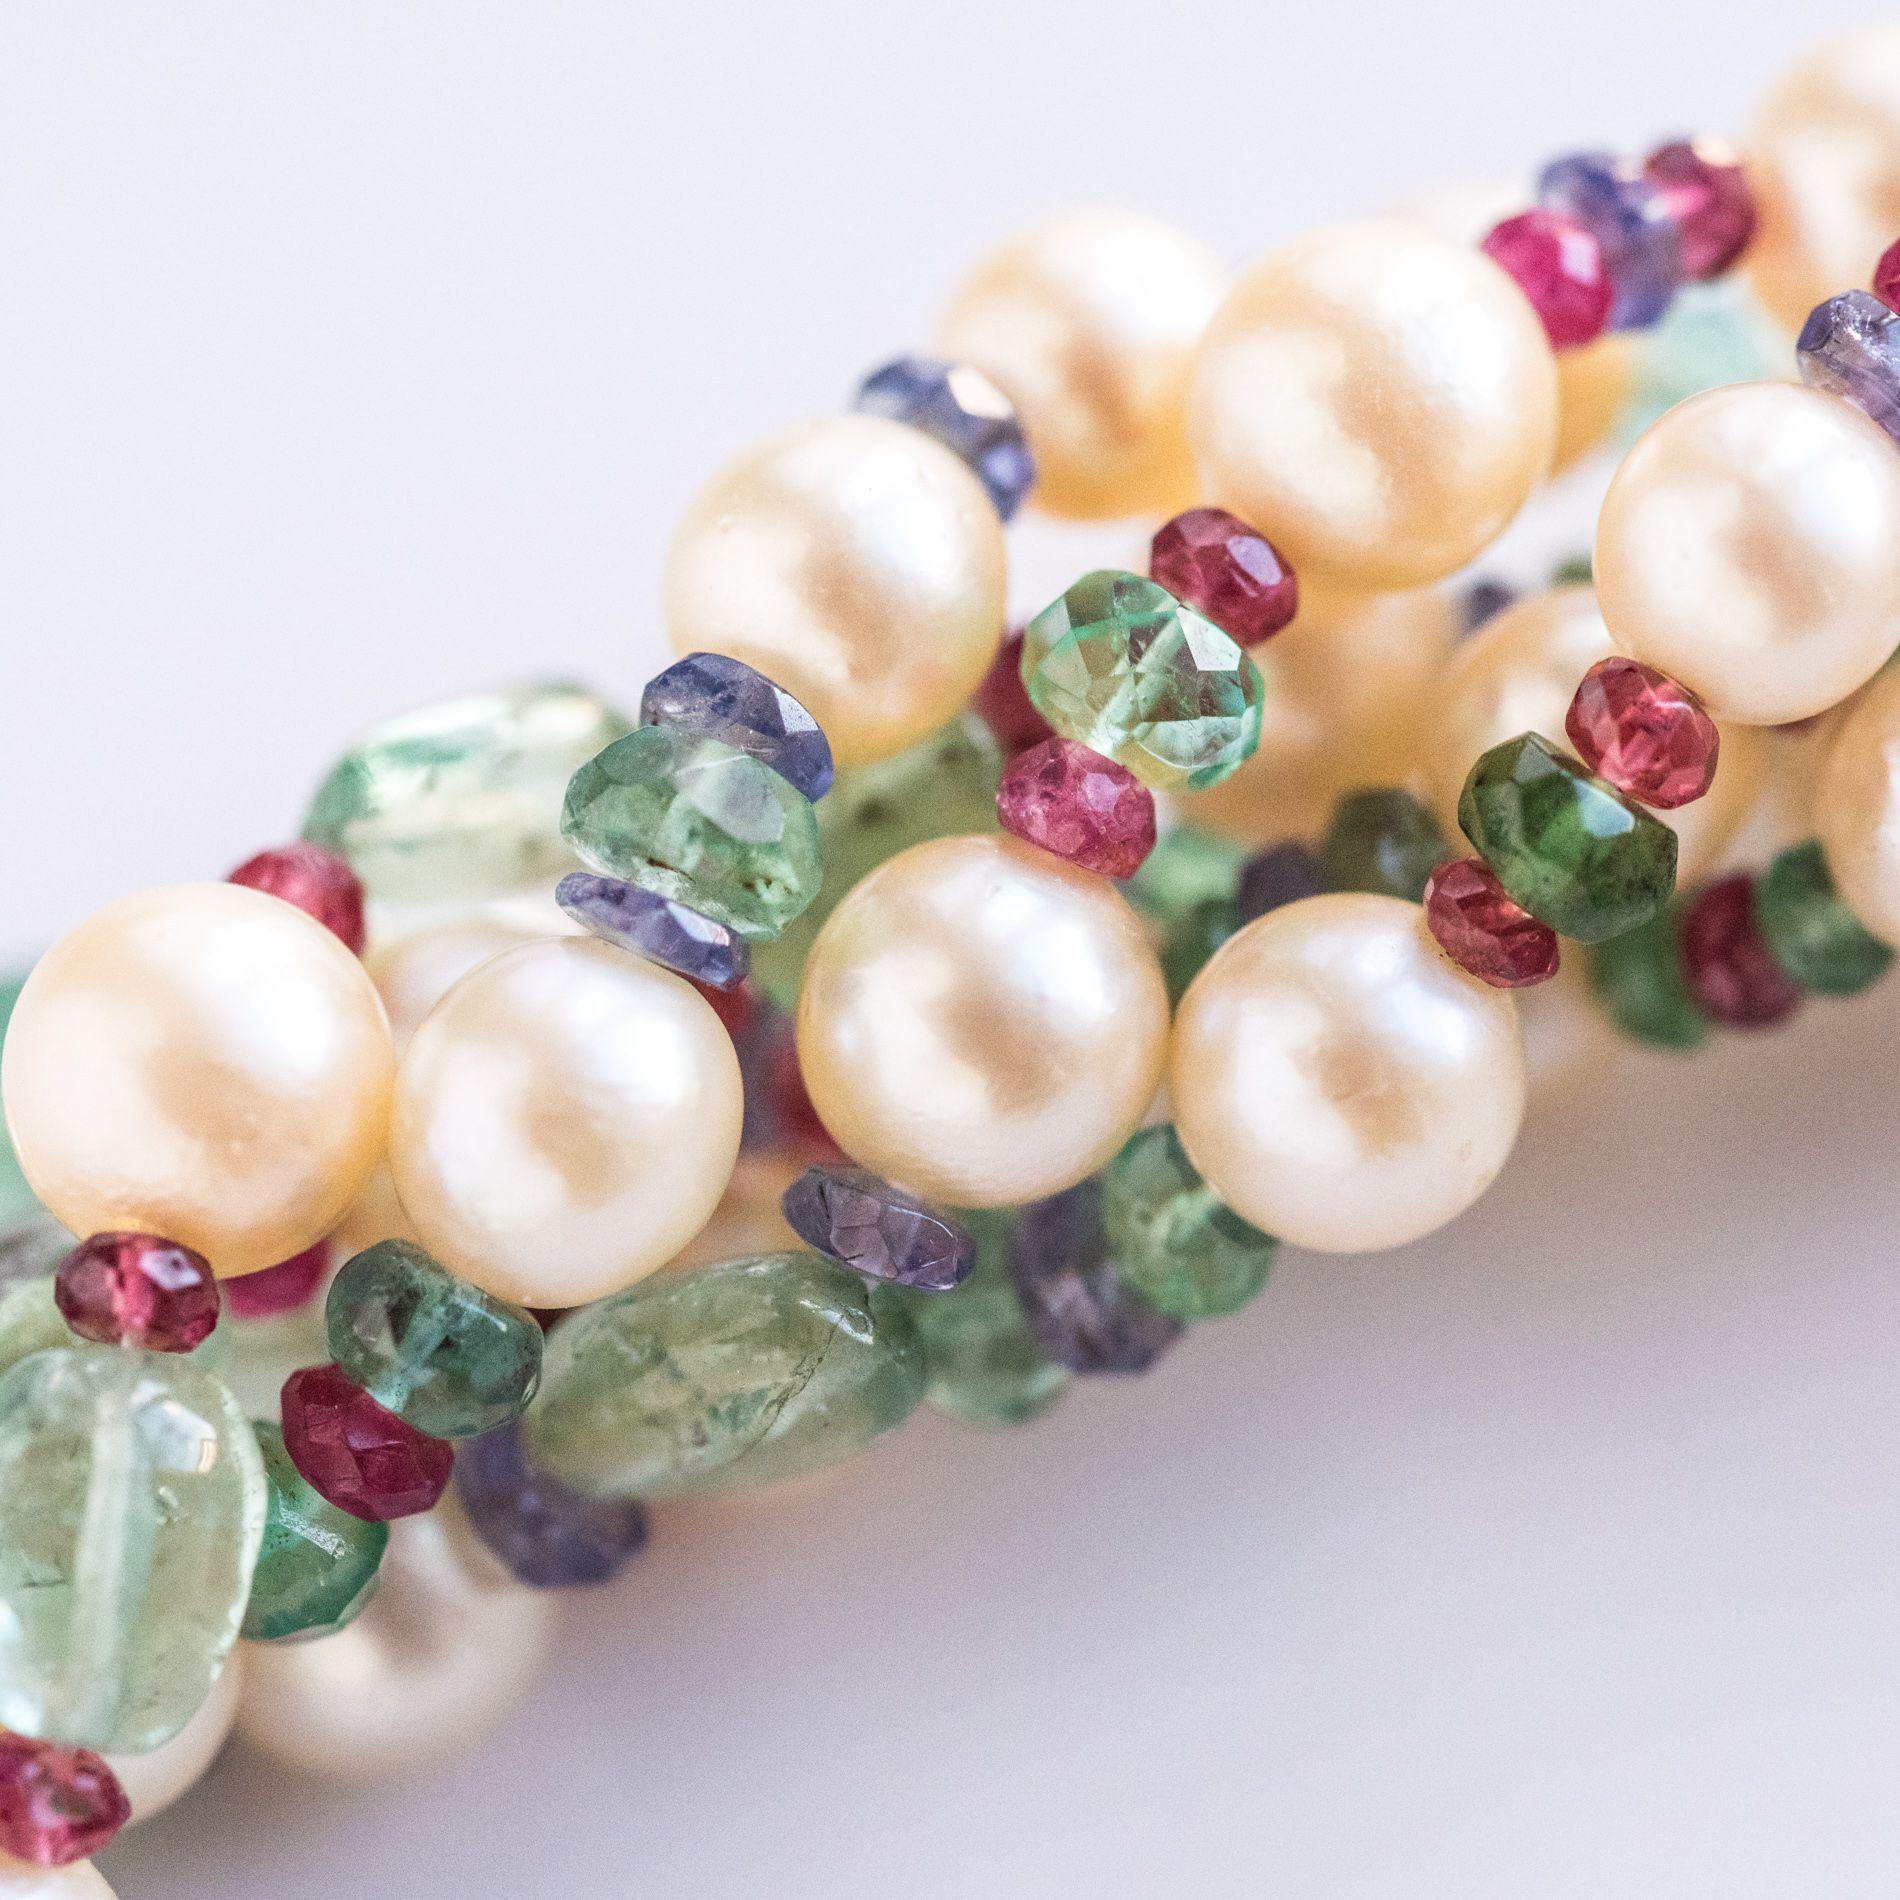 Collier Perles, Emeraudes, Saphirs, Rubis et Spinelles